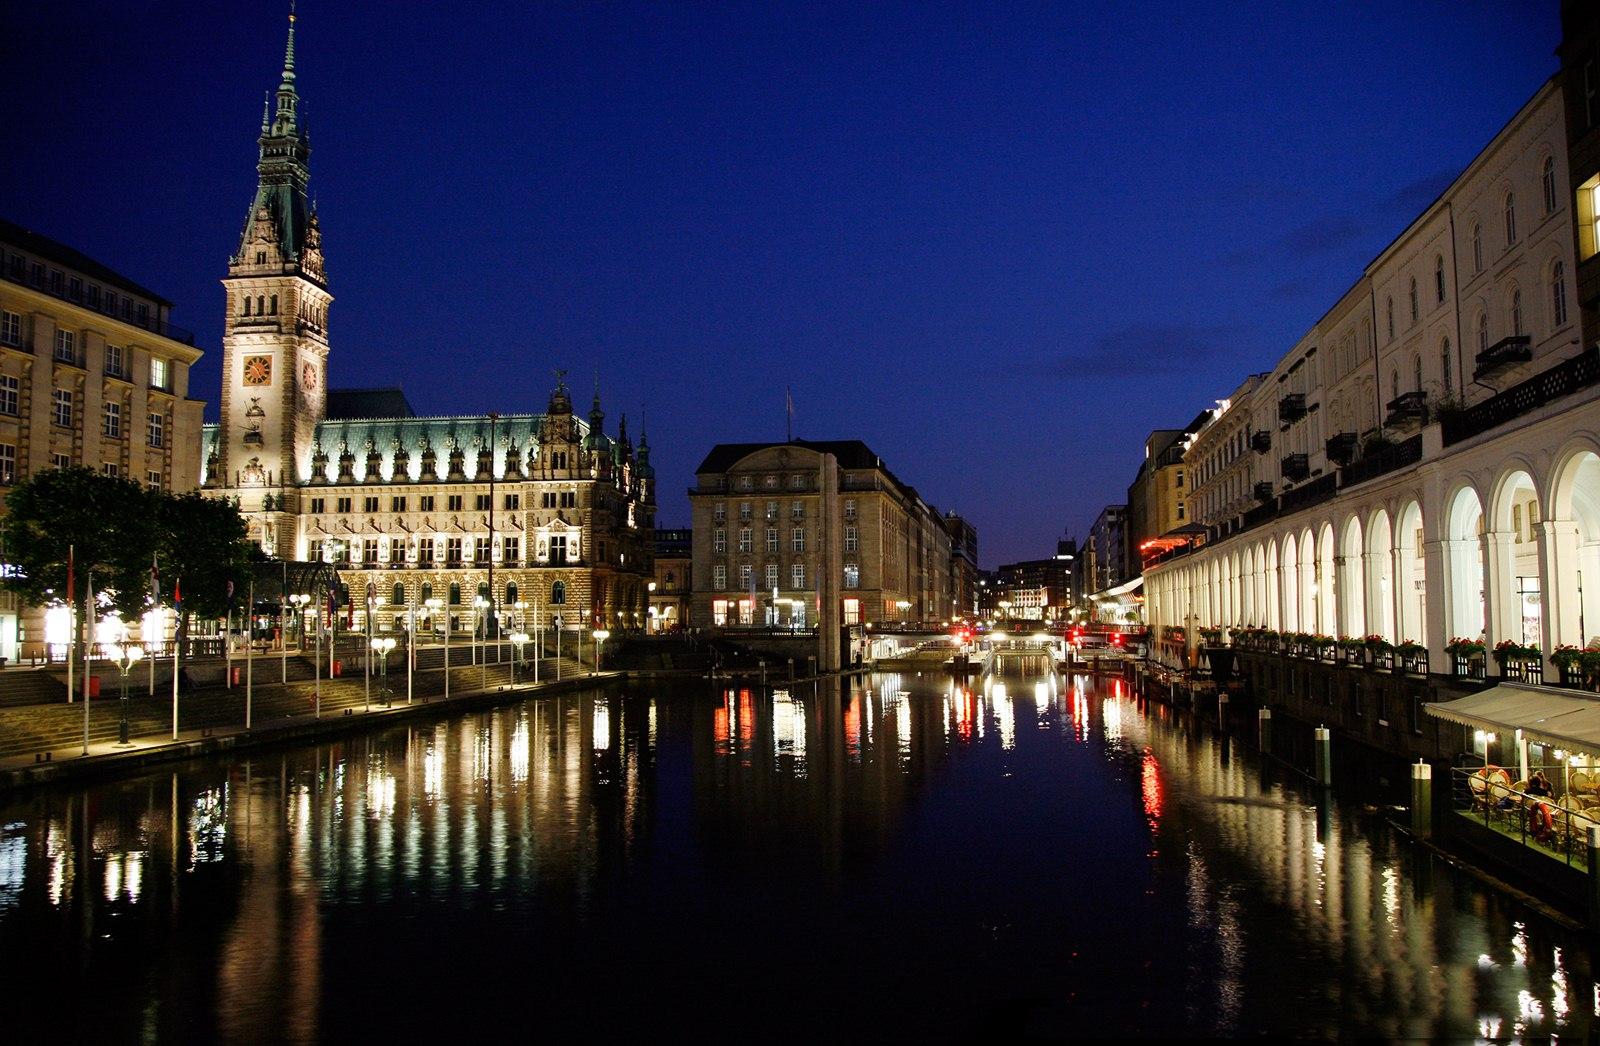 Hamburg The best lighting design stores in Hamburg The best lighting design stores in Hamburg